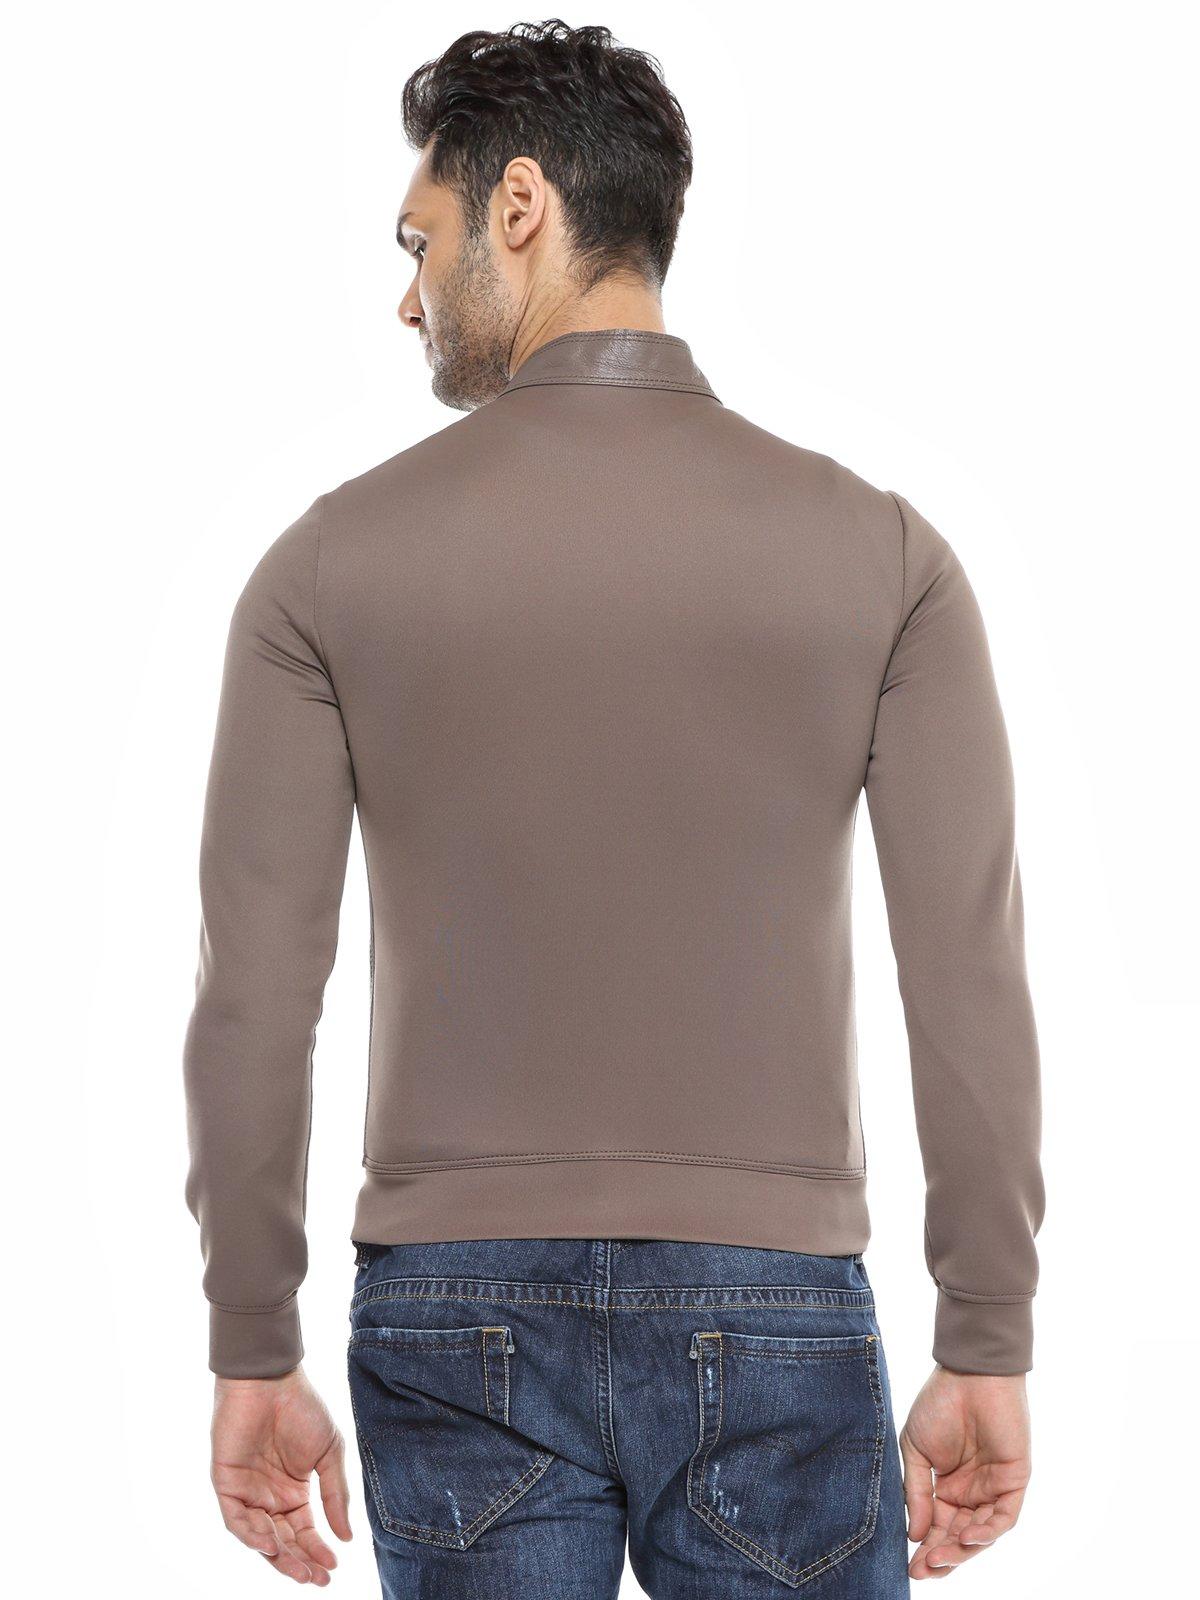 Куртка цвета фанго | 1373458 | фото 7